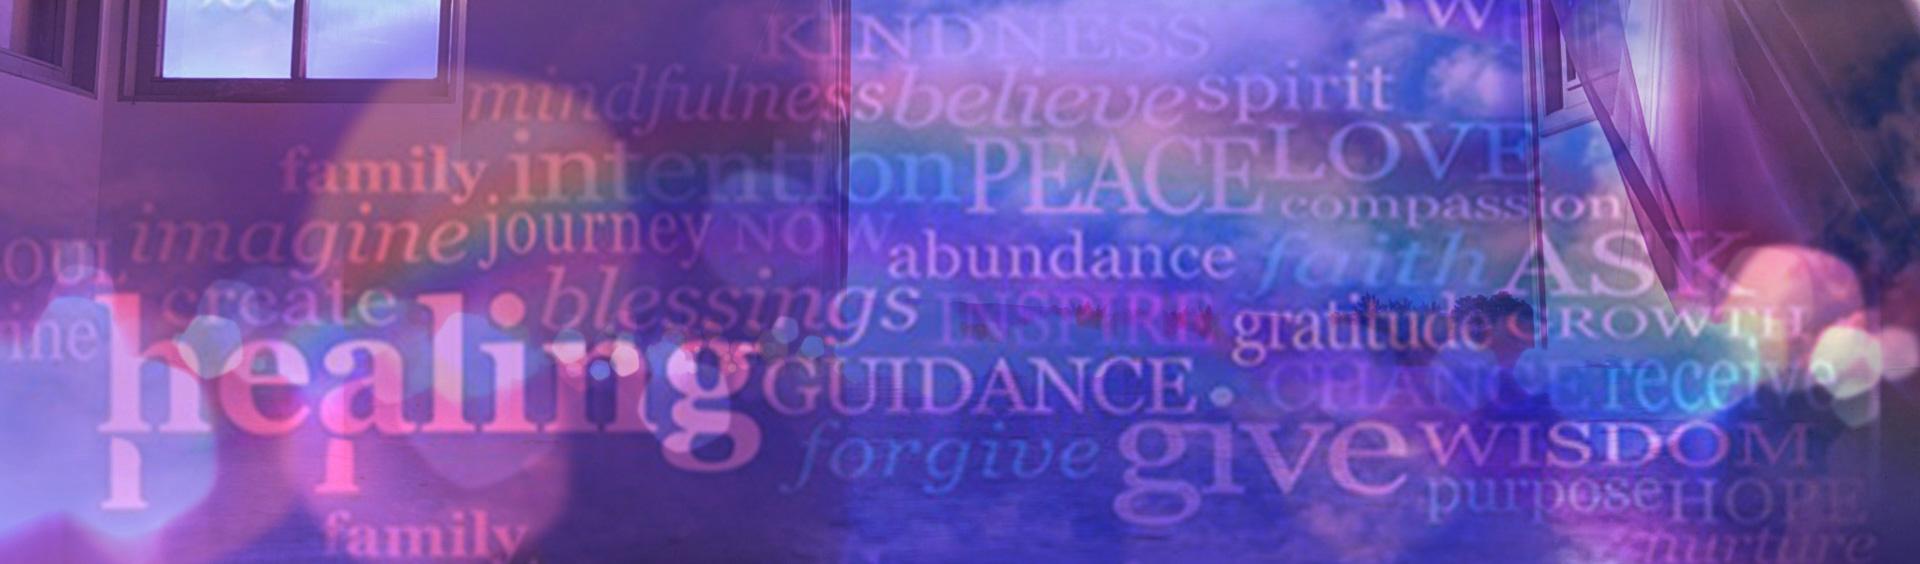 Passionen_leben_blog-healing